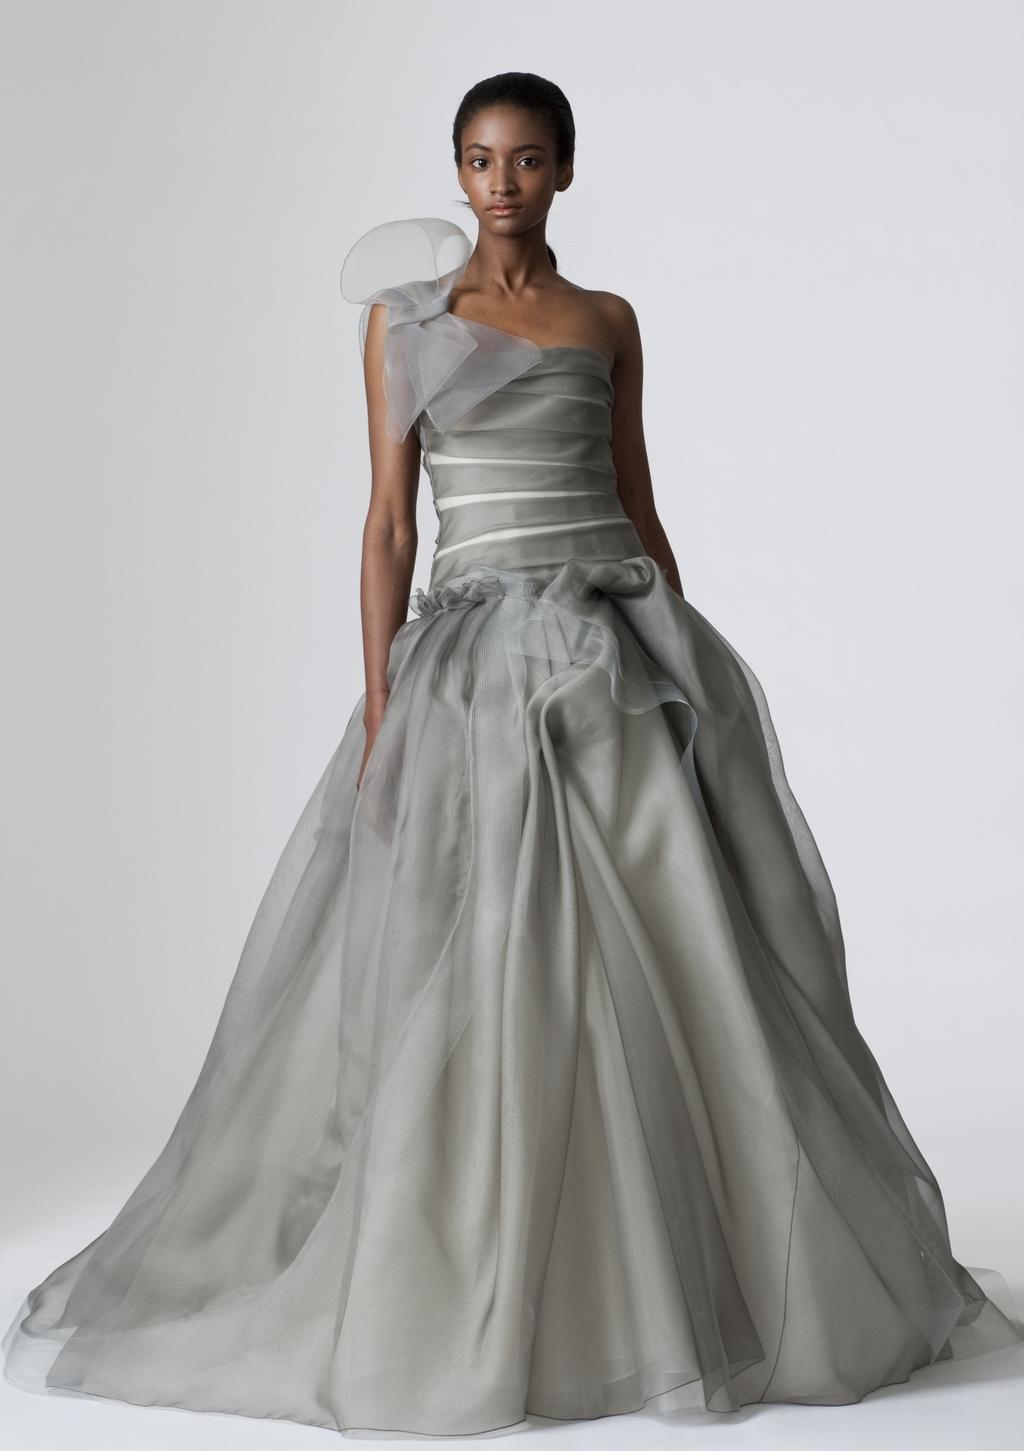 Vera-wang-wedding-dresses-spring-2010-10.full